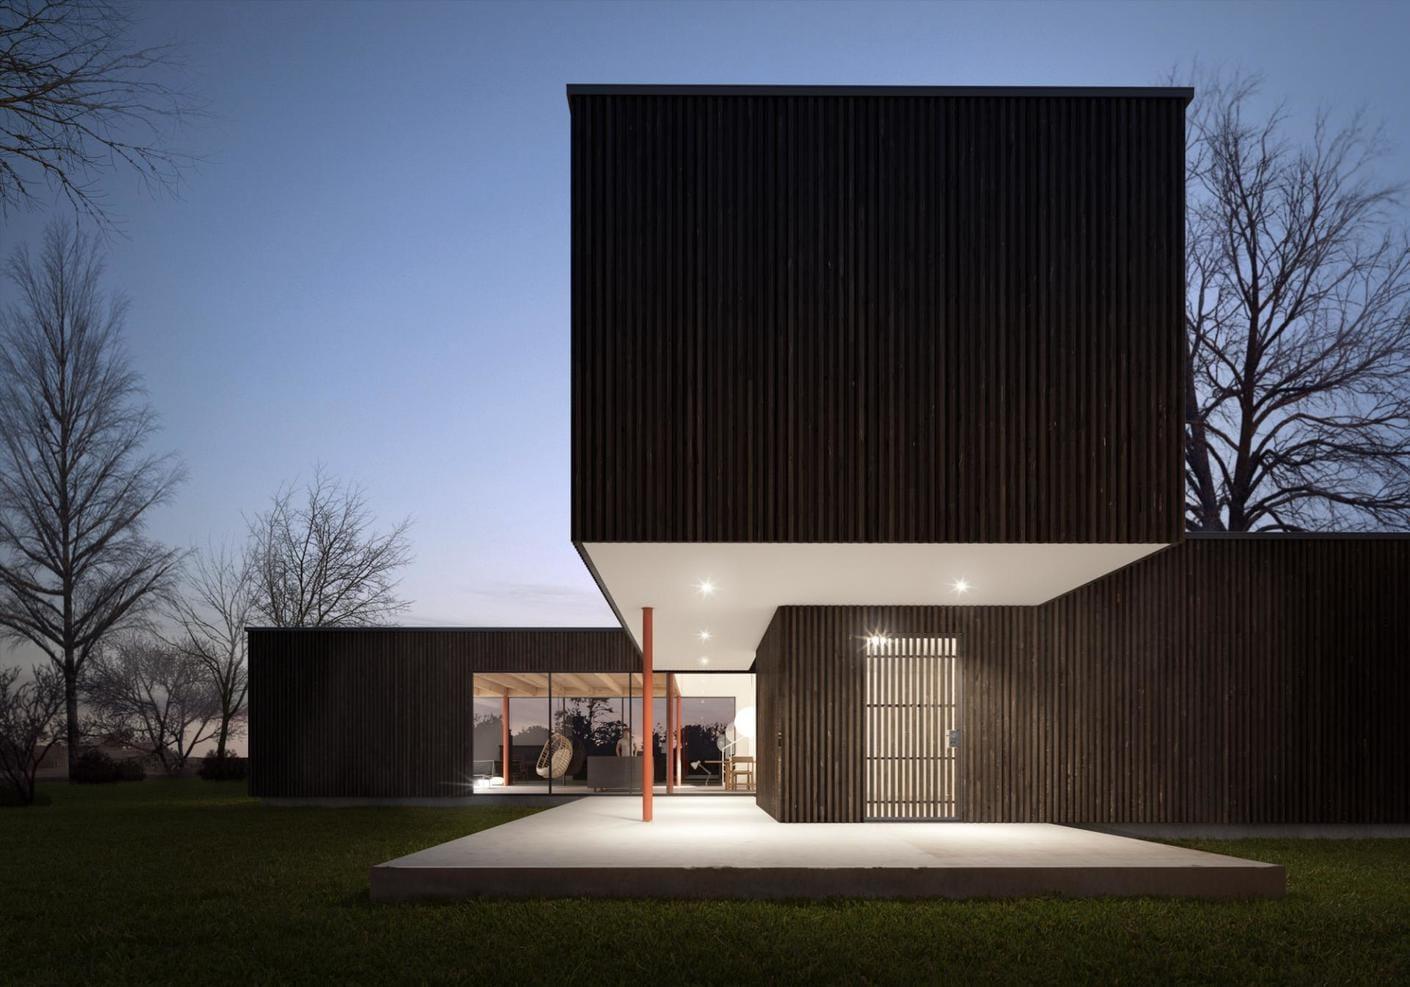 alexander-razgonyaev-huize-looveld-architecture-vray-3ds-max-02